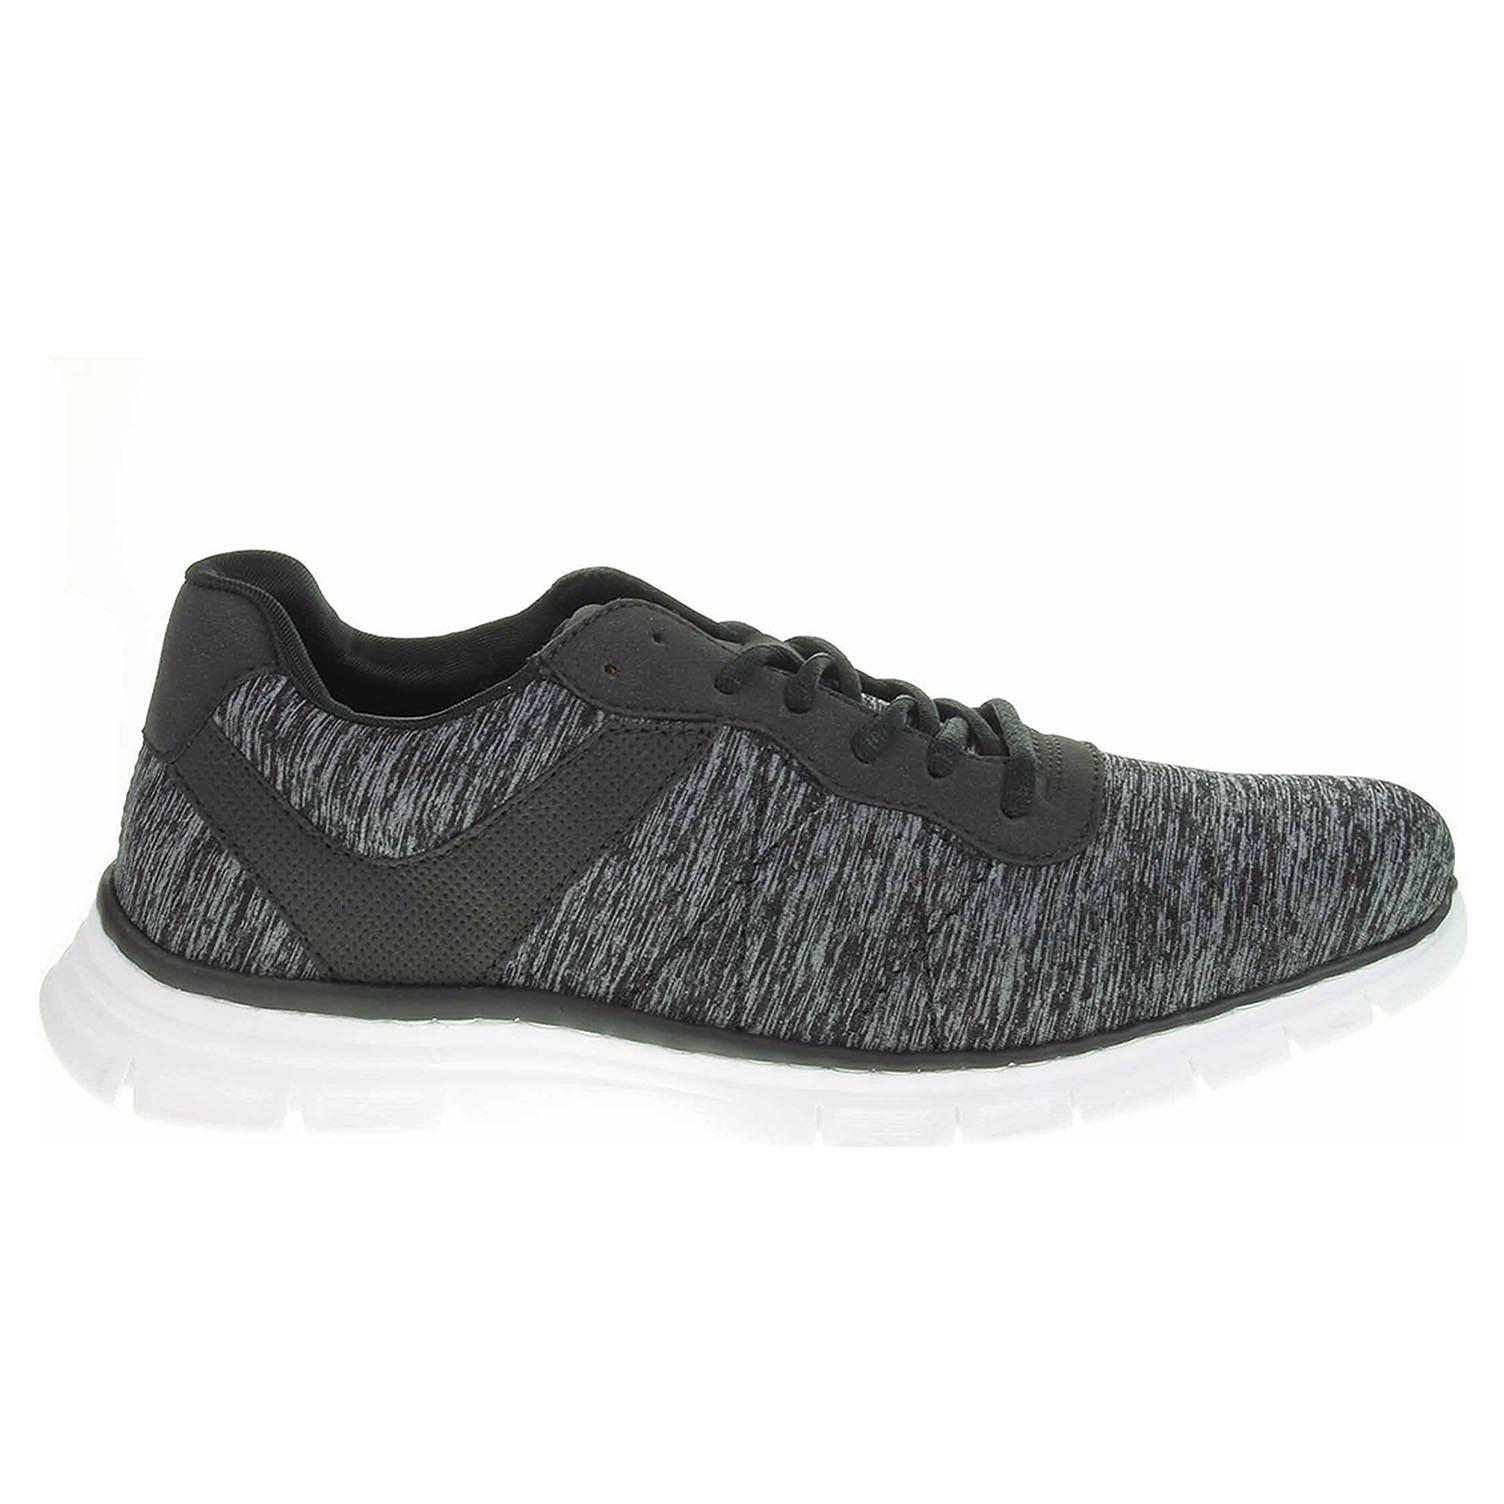 Rieker pánská obuv B4808-46 schwarz kombi B4808-46 47